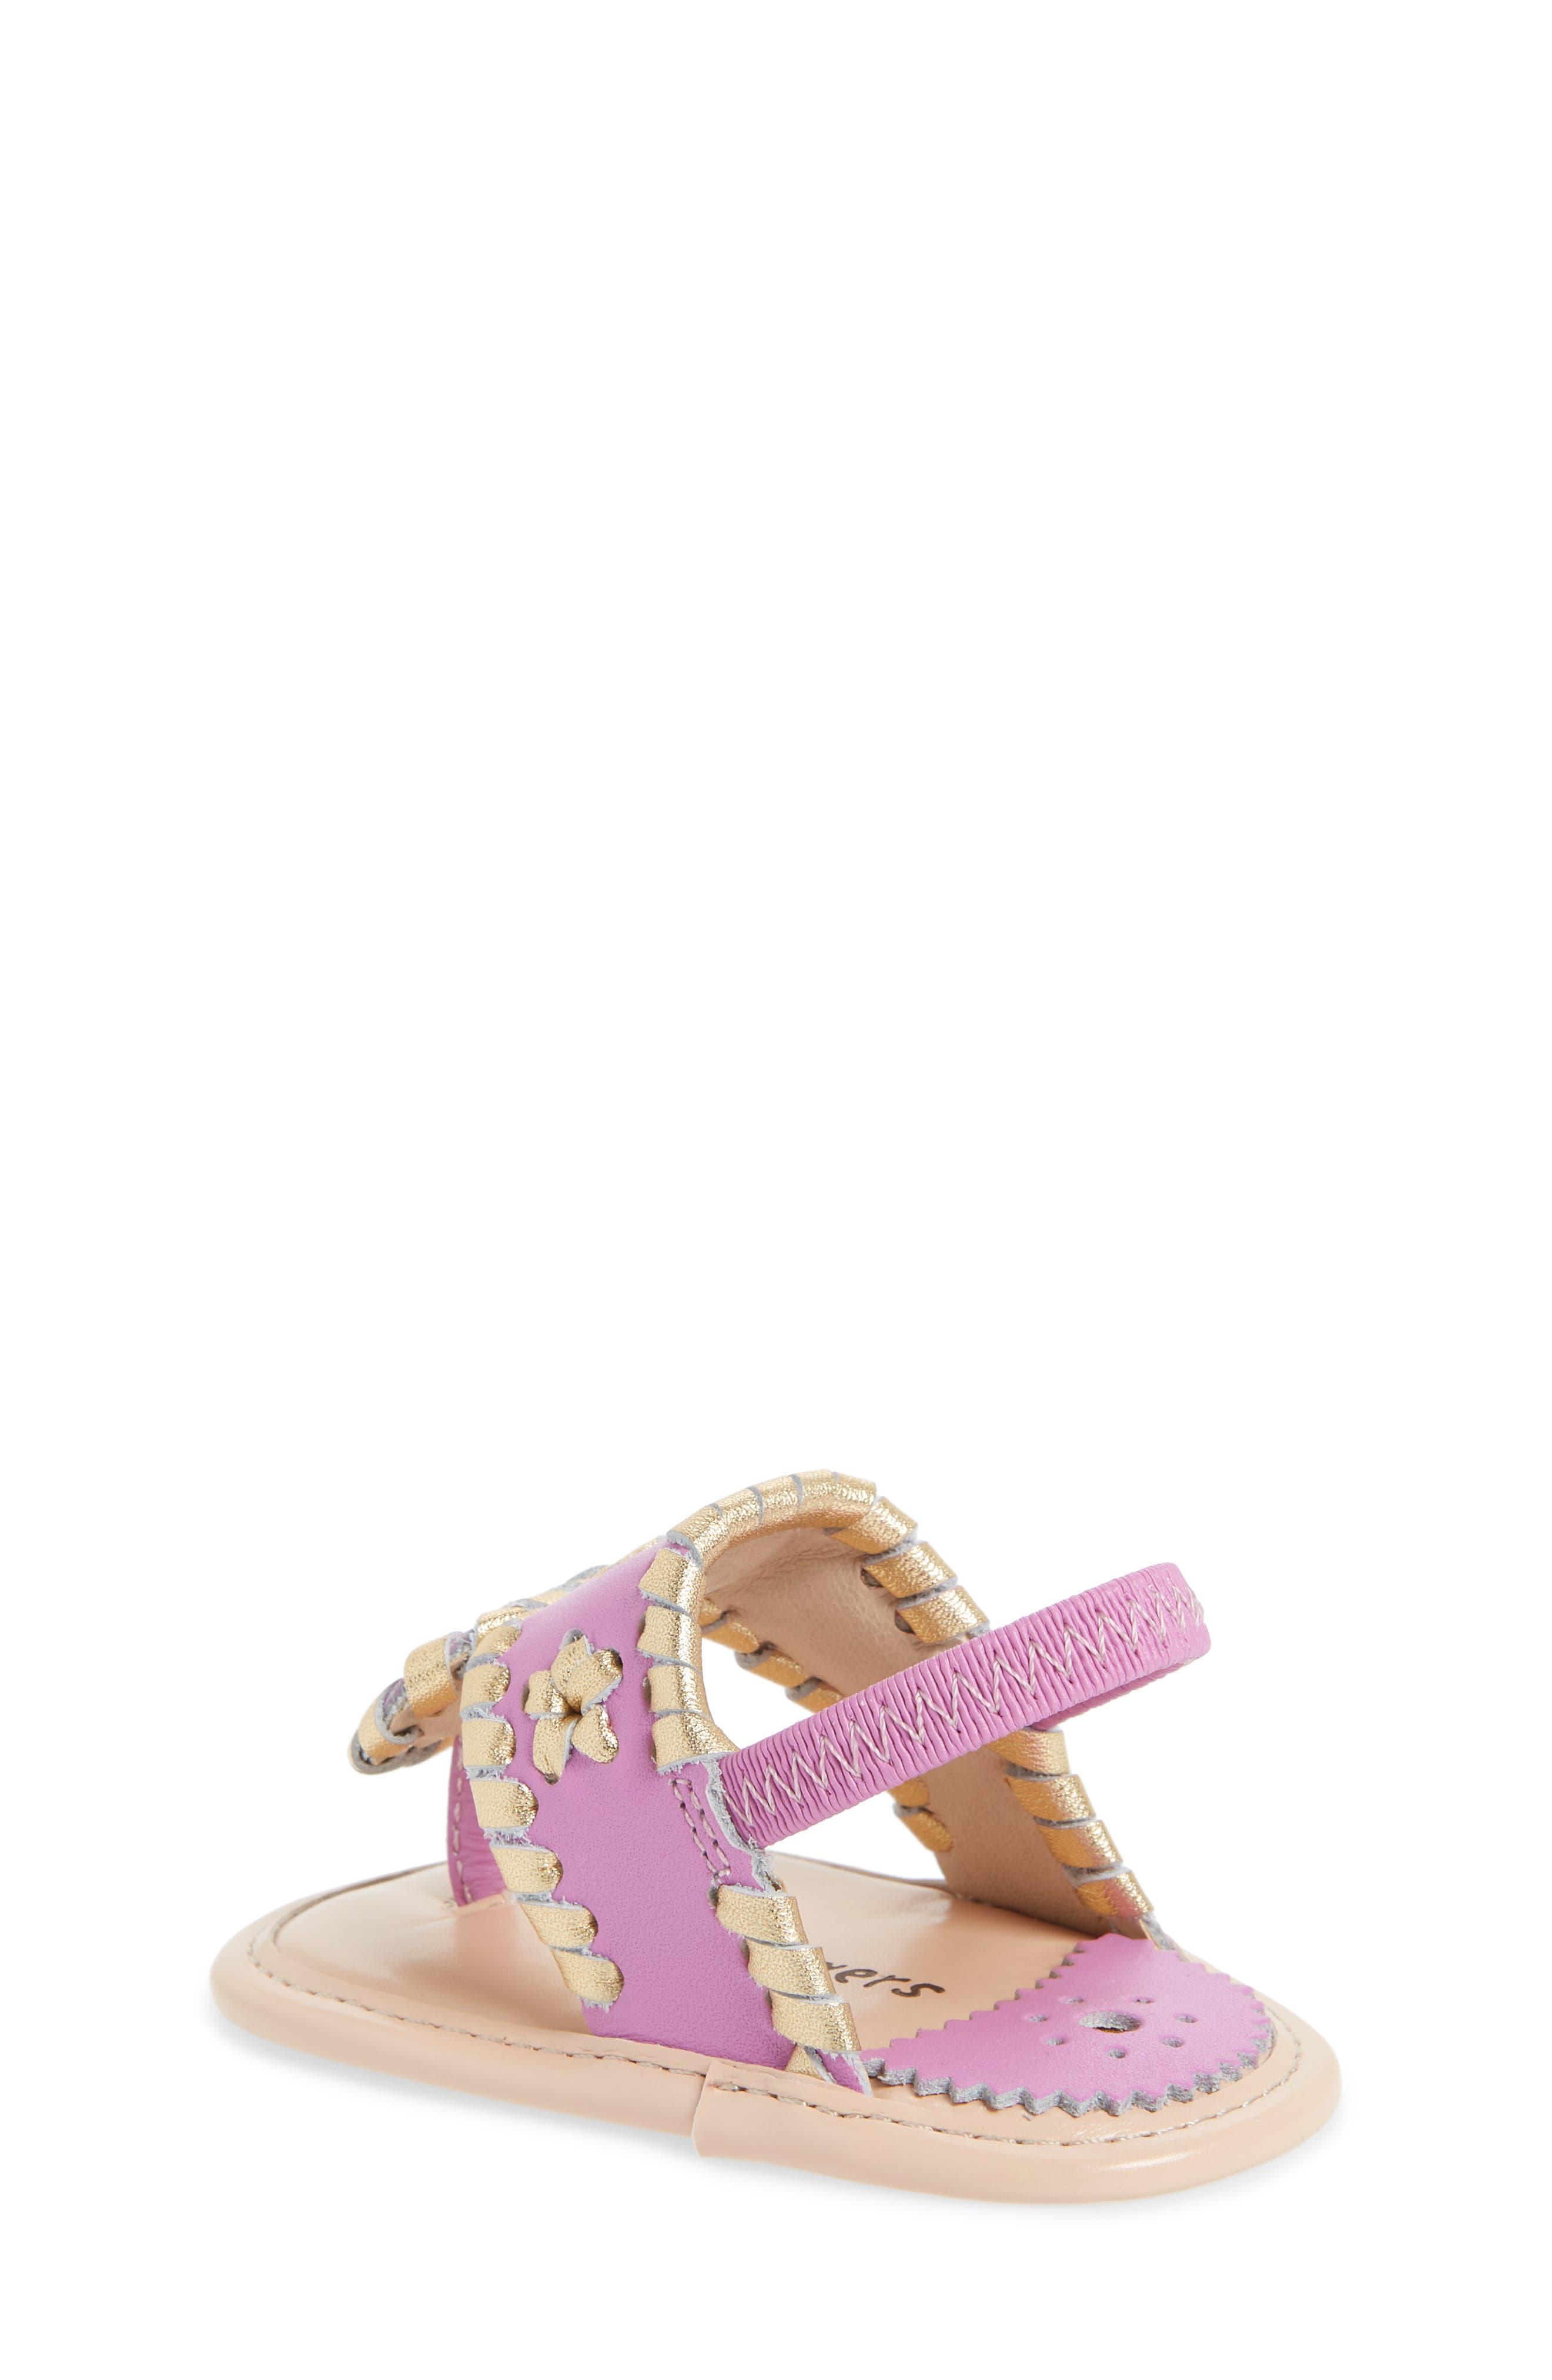 Hollis Sandal,                             Alternate thumbnail 2, color,                             Lavender Pink/ Gold Leather